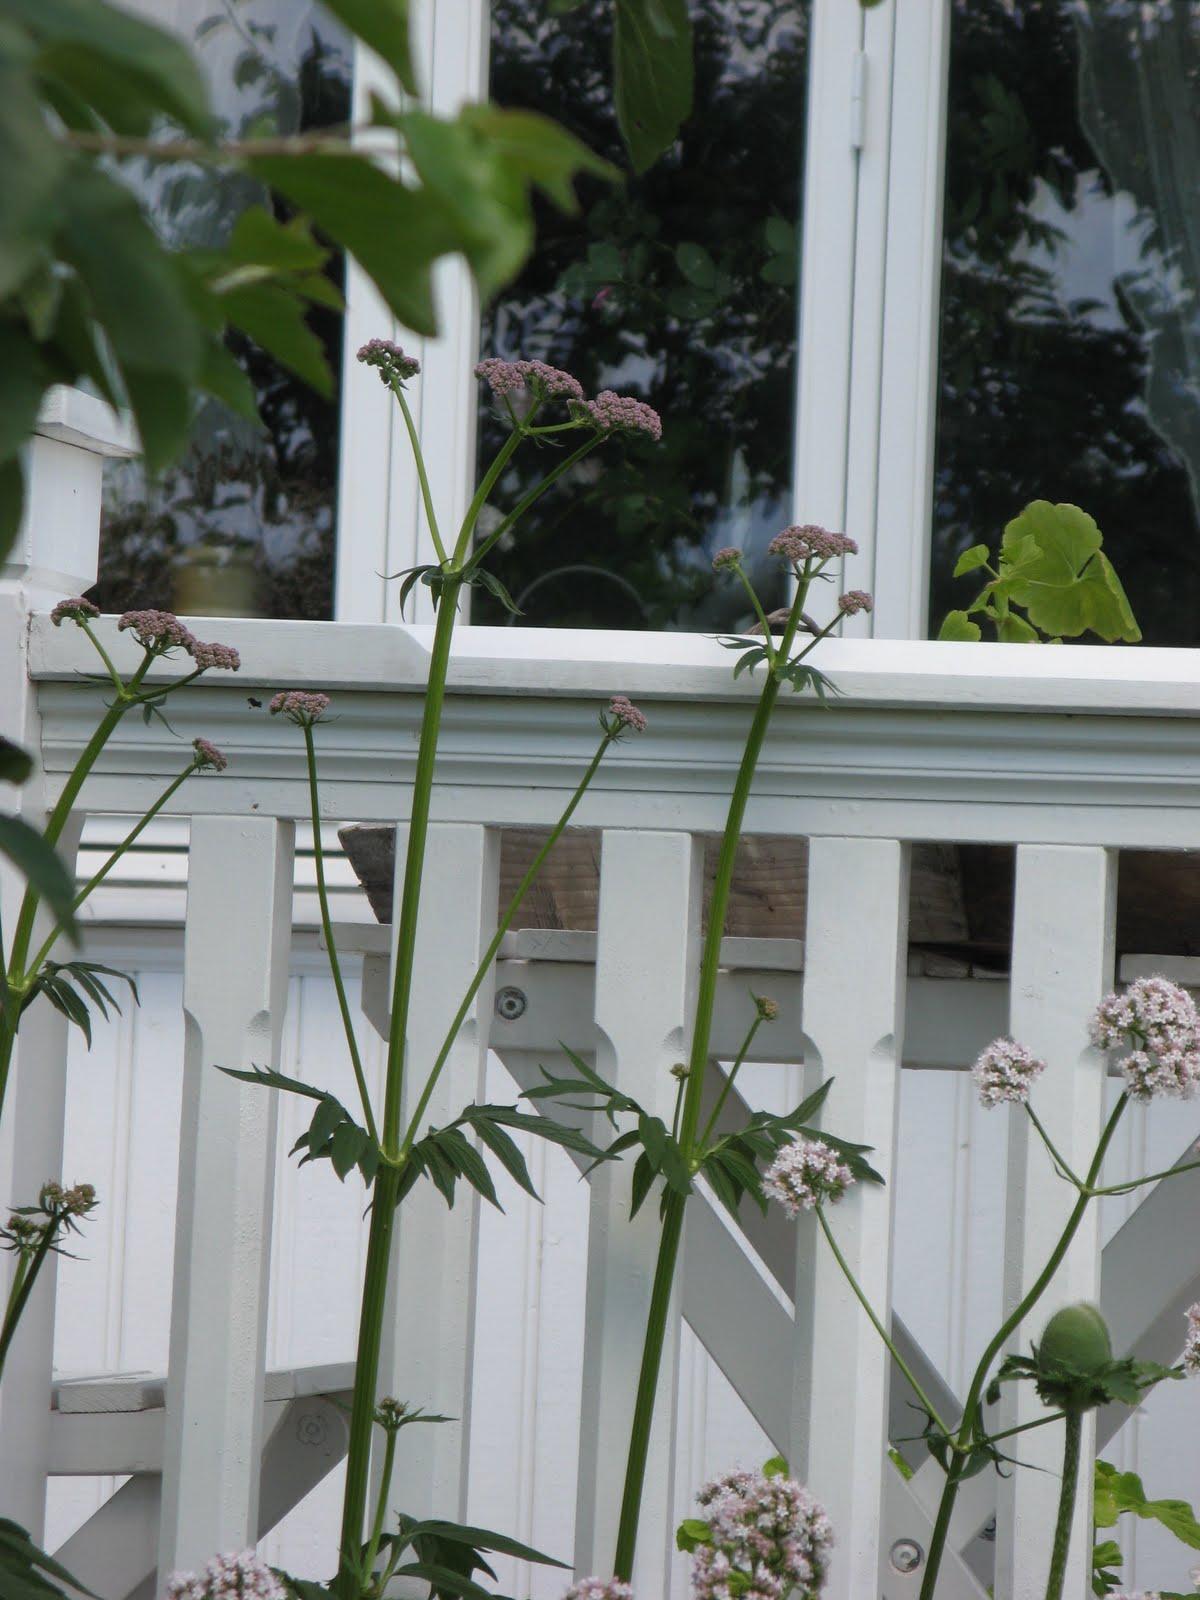 hvilken plante liker peoner